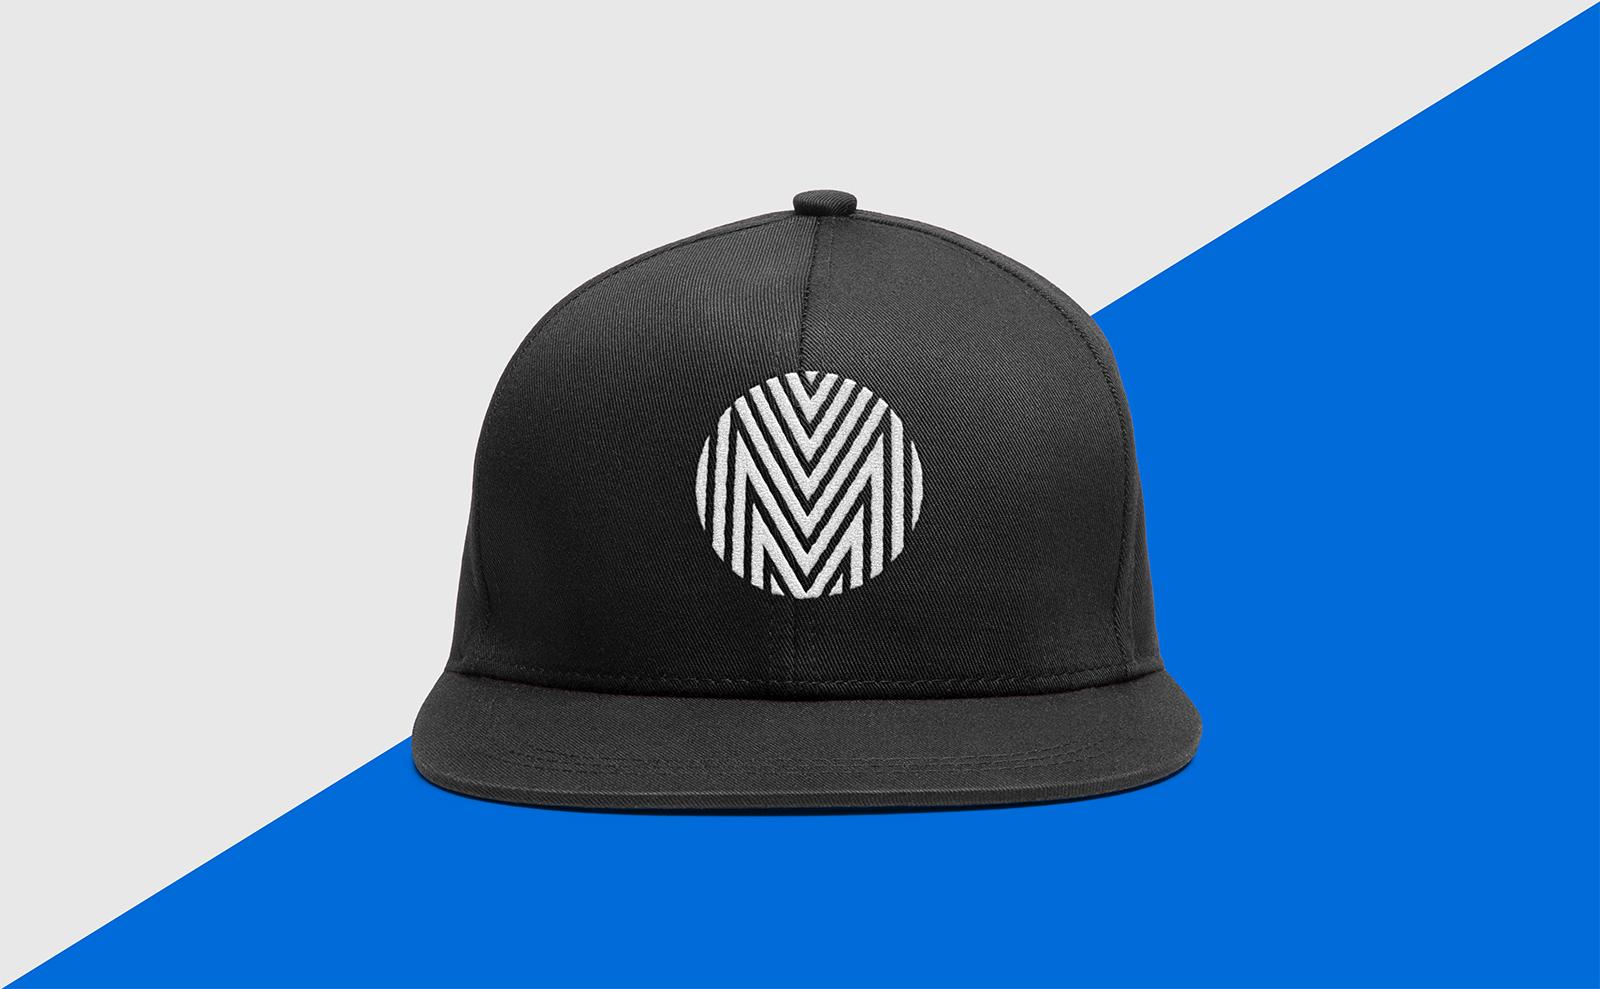 Global Minnesota black cap with logo